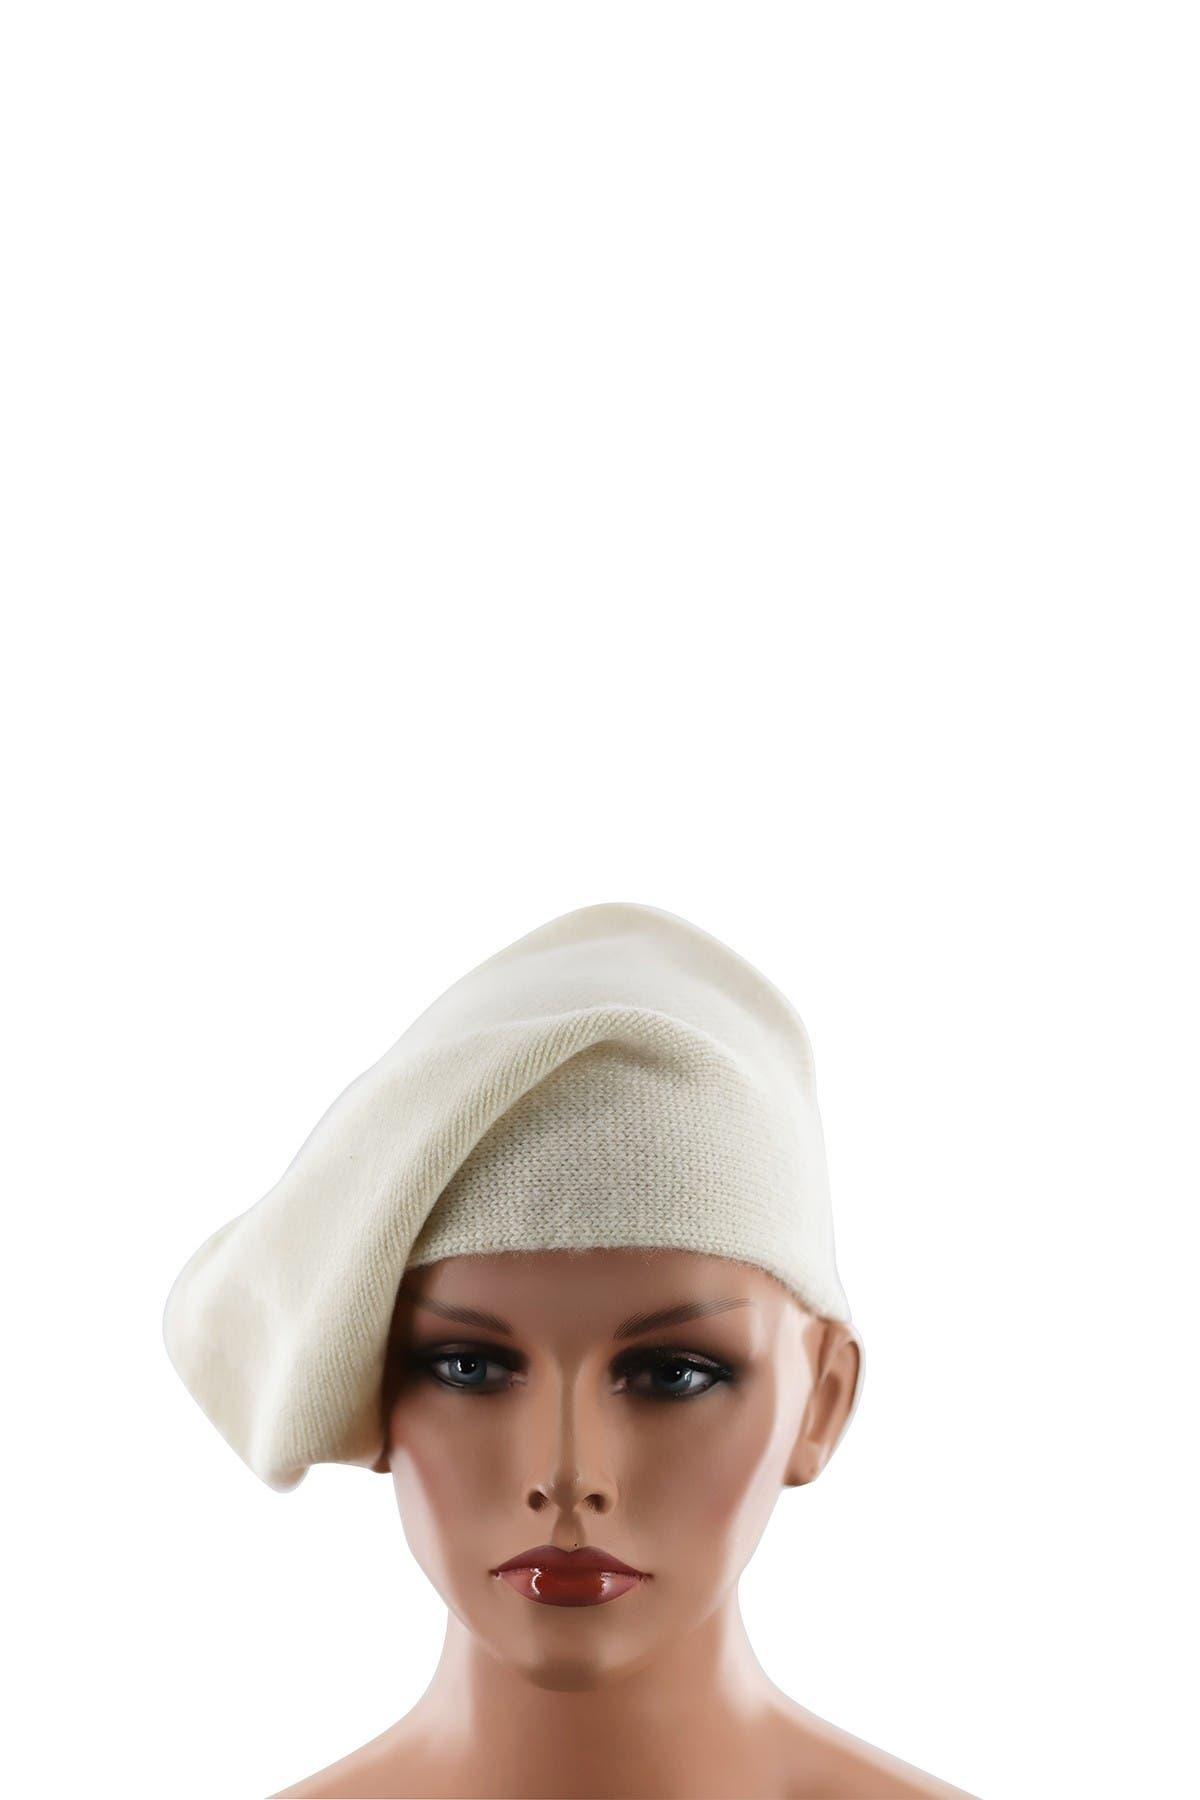 Image of La Fiorentina Wool Blend Beanie